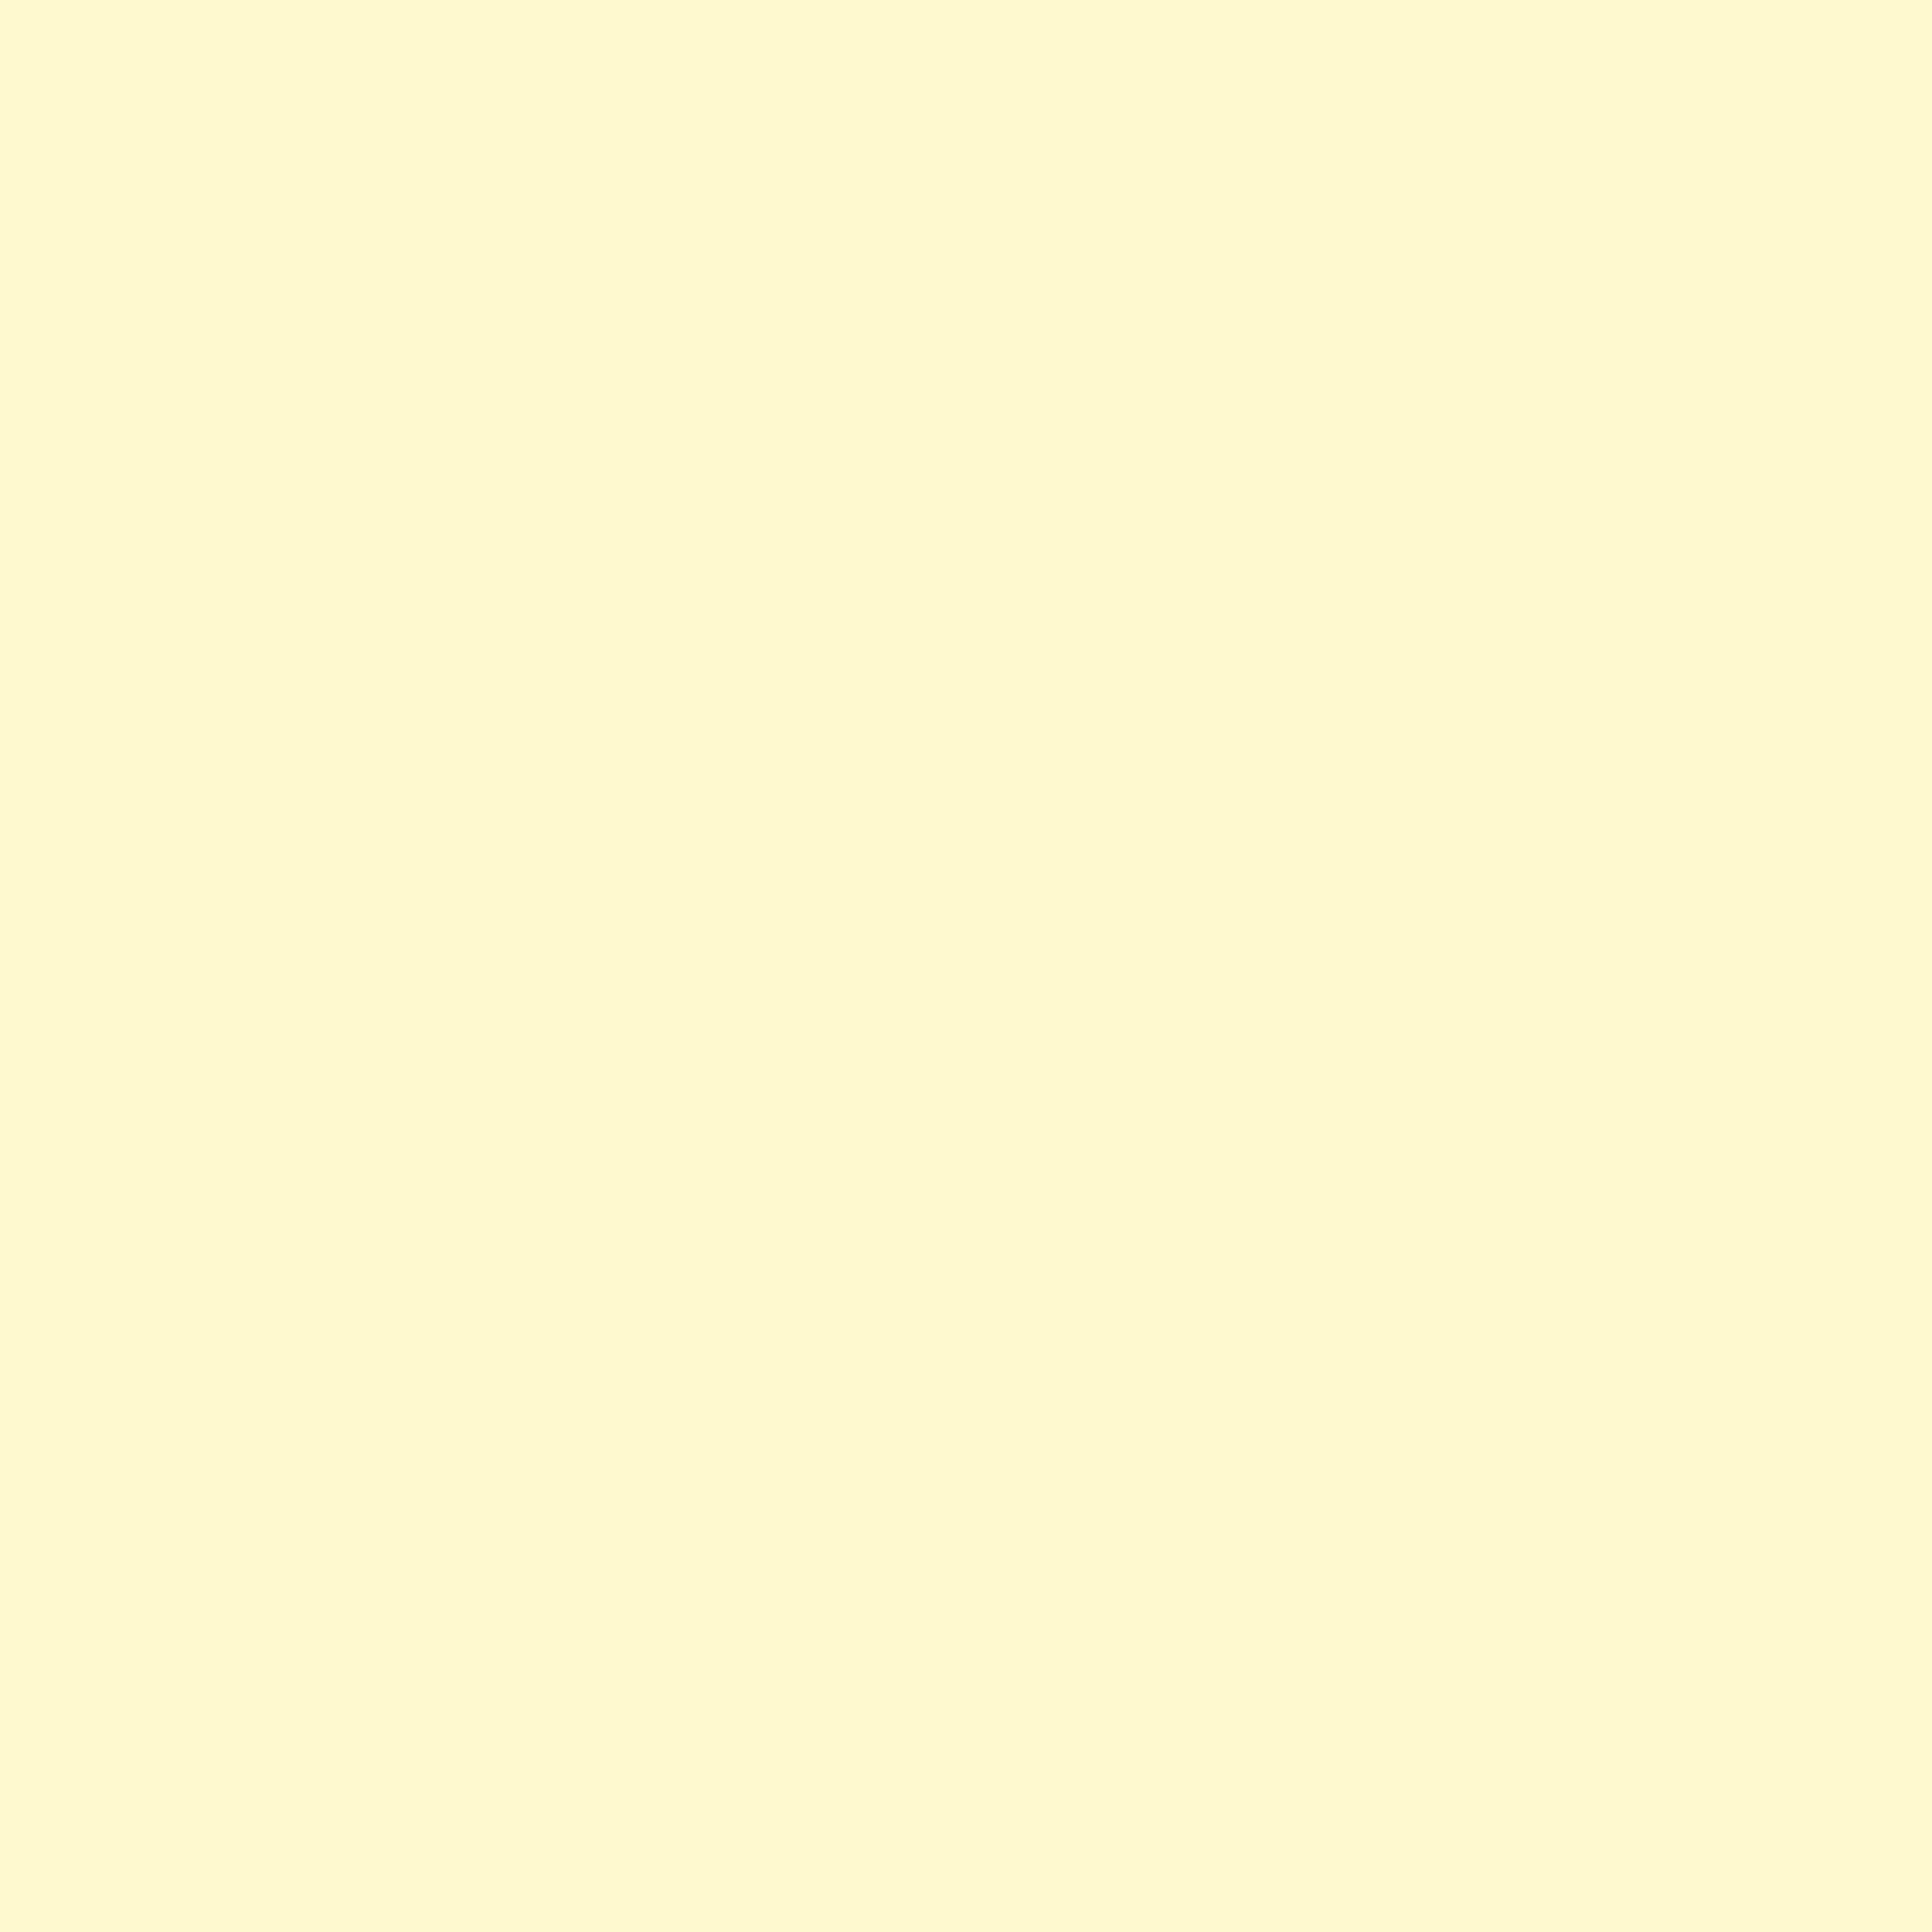 3600x3600 Lemon Chiffon Solid Color Background